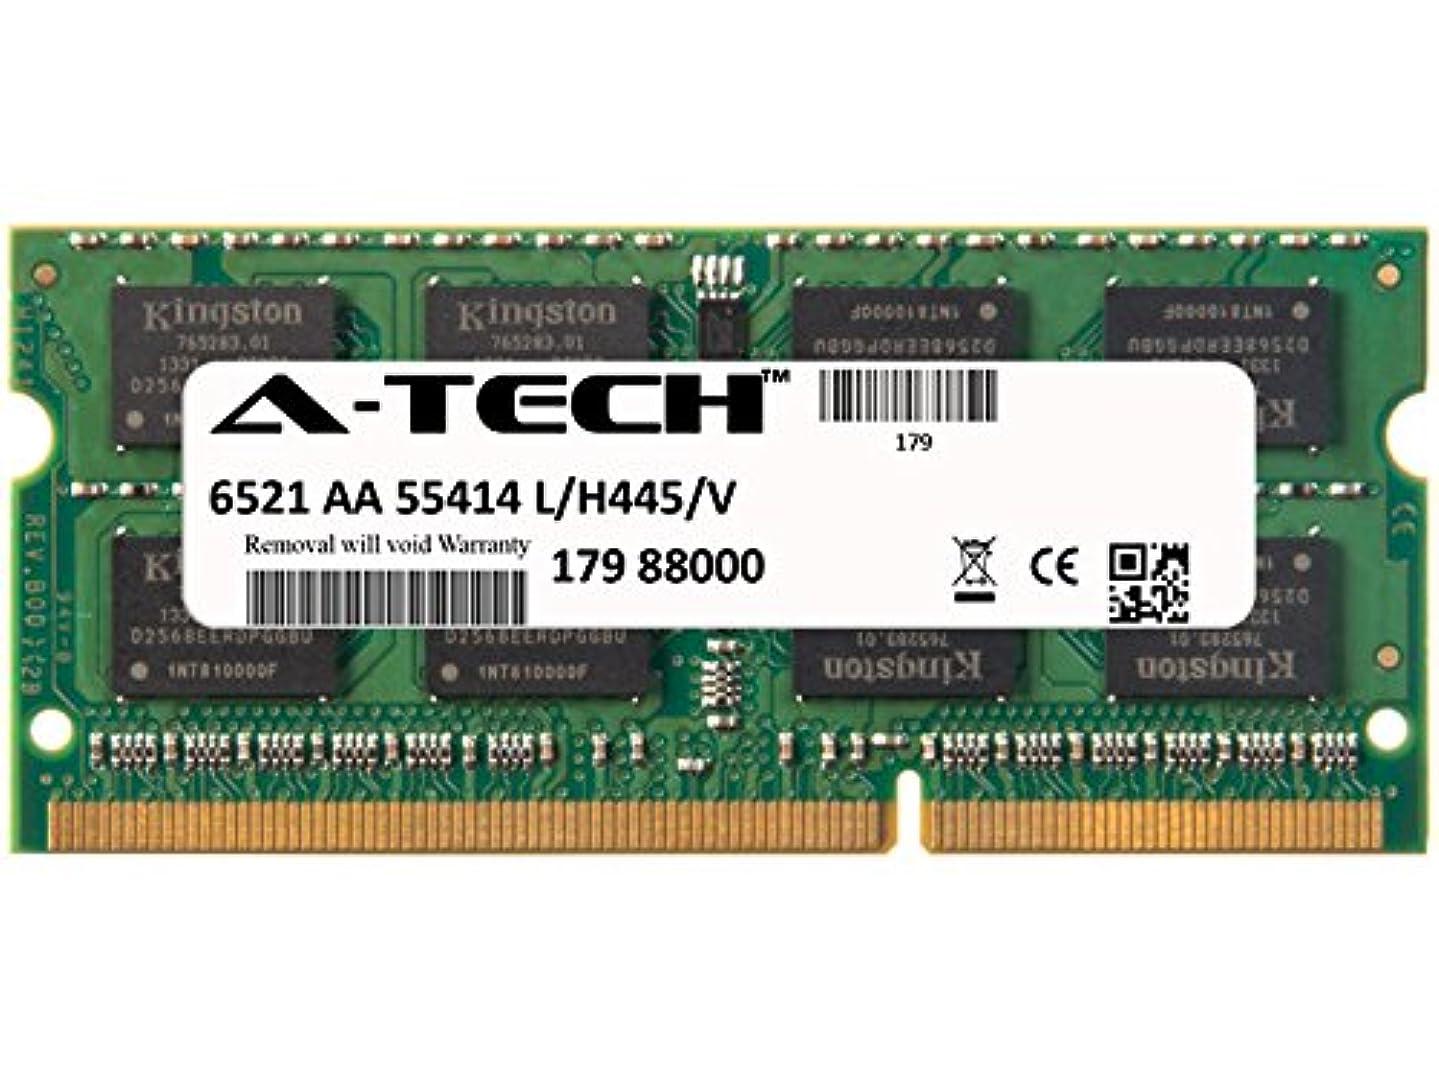 4GB Stick for Dell Optiplex Series 3011 (All-in-One) 9010 (All-in-One) 9020 (All-in-One). SO-DIMM DDR3 Non-ECC PC3-12800 1600MHz RAM Memory. Genuine A-Tech Brand.